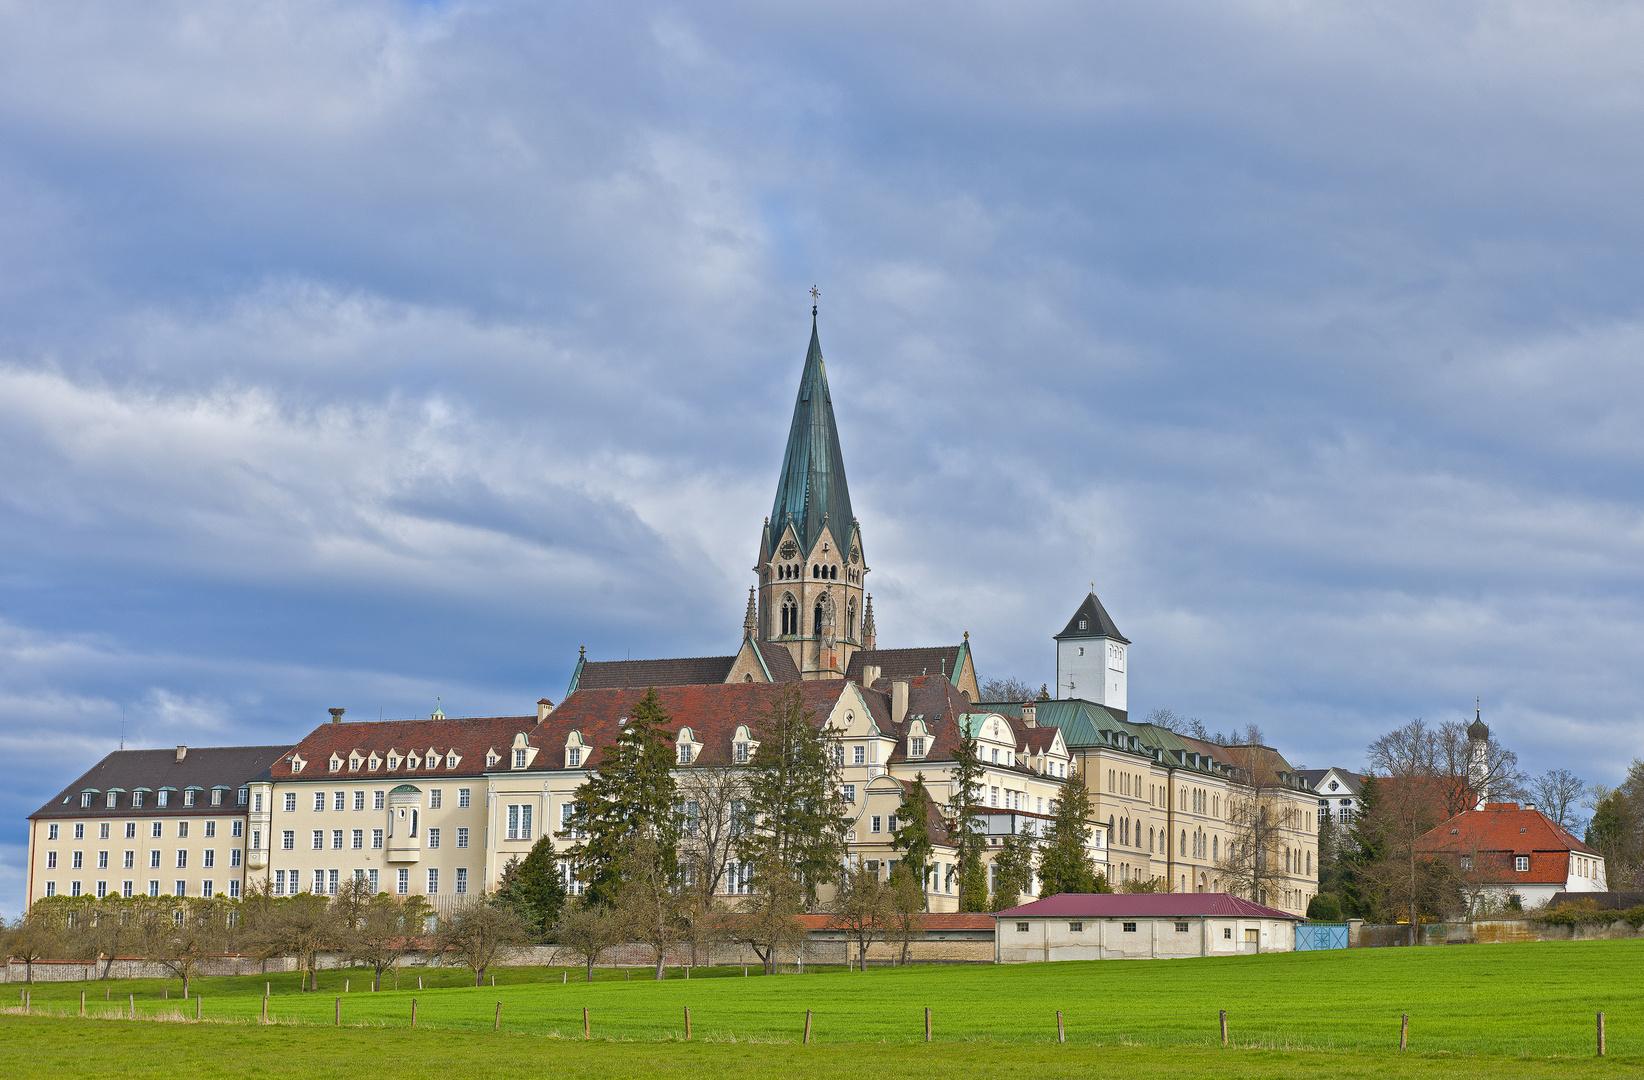 Benediktiner Abtei St. Ottilien